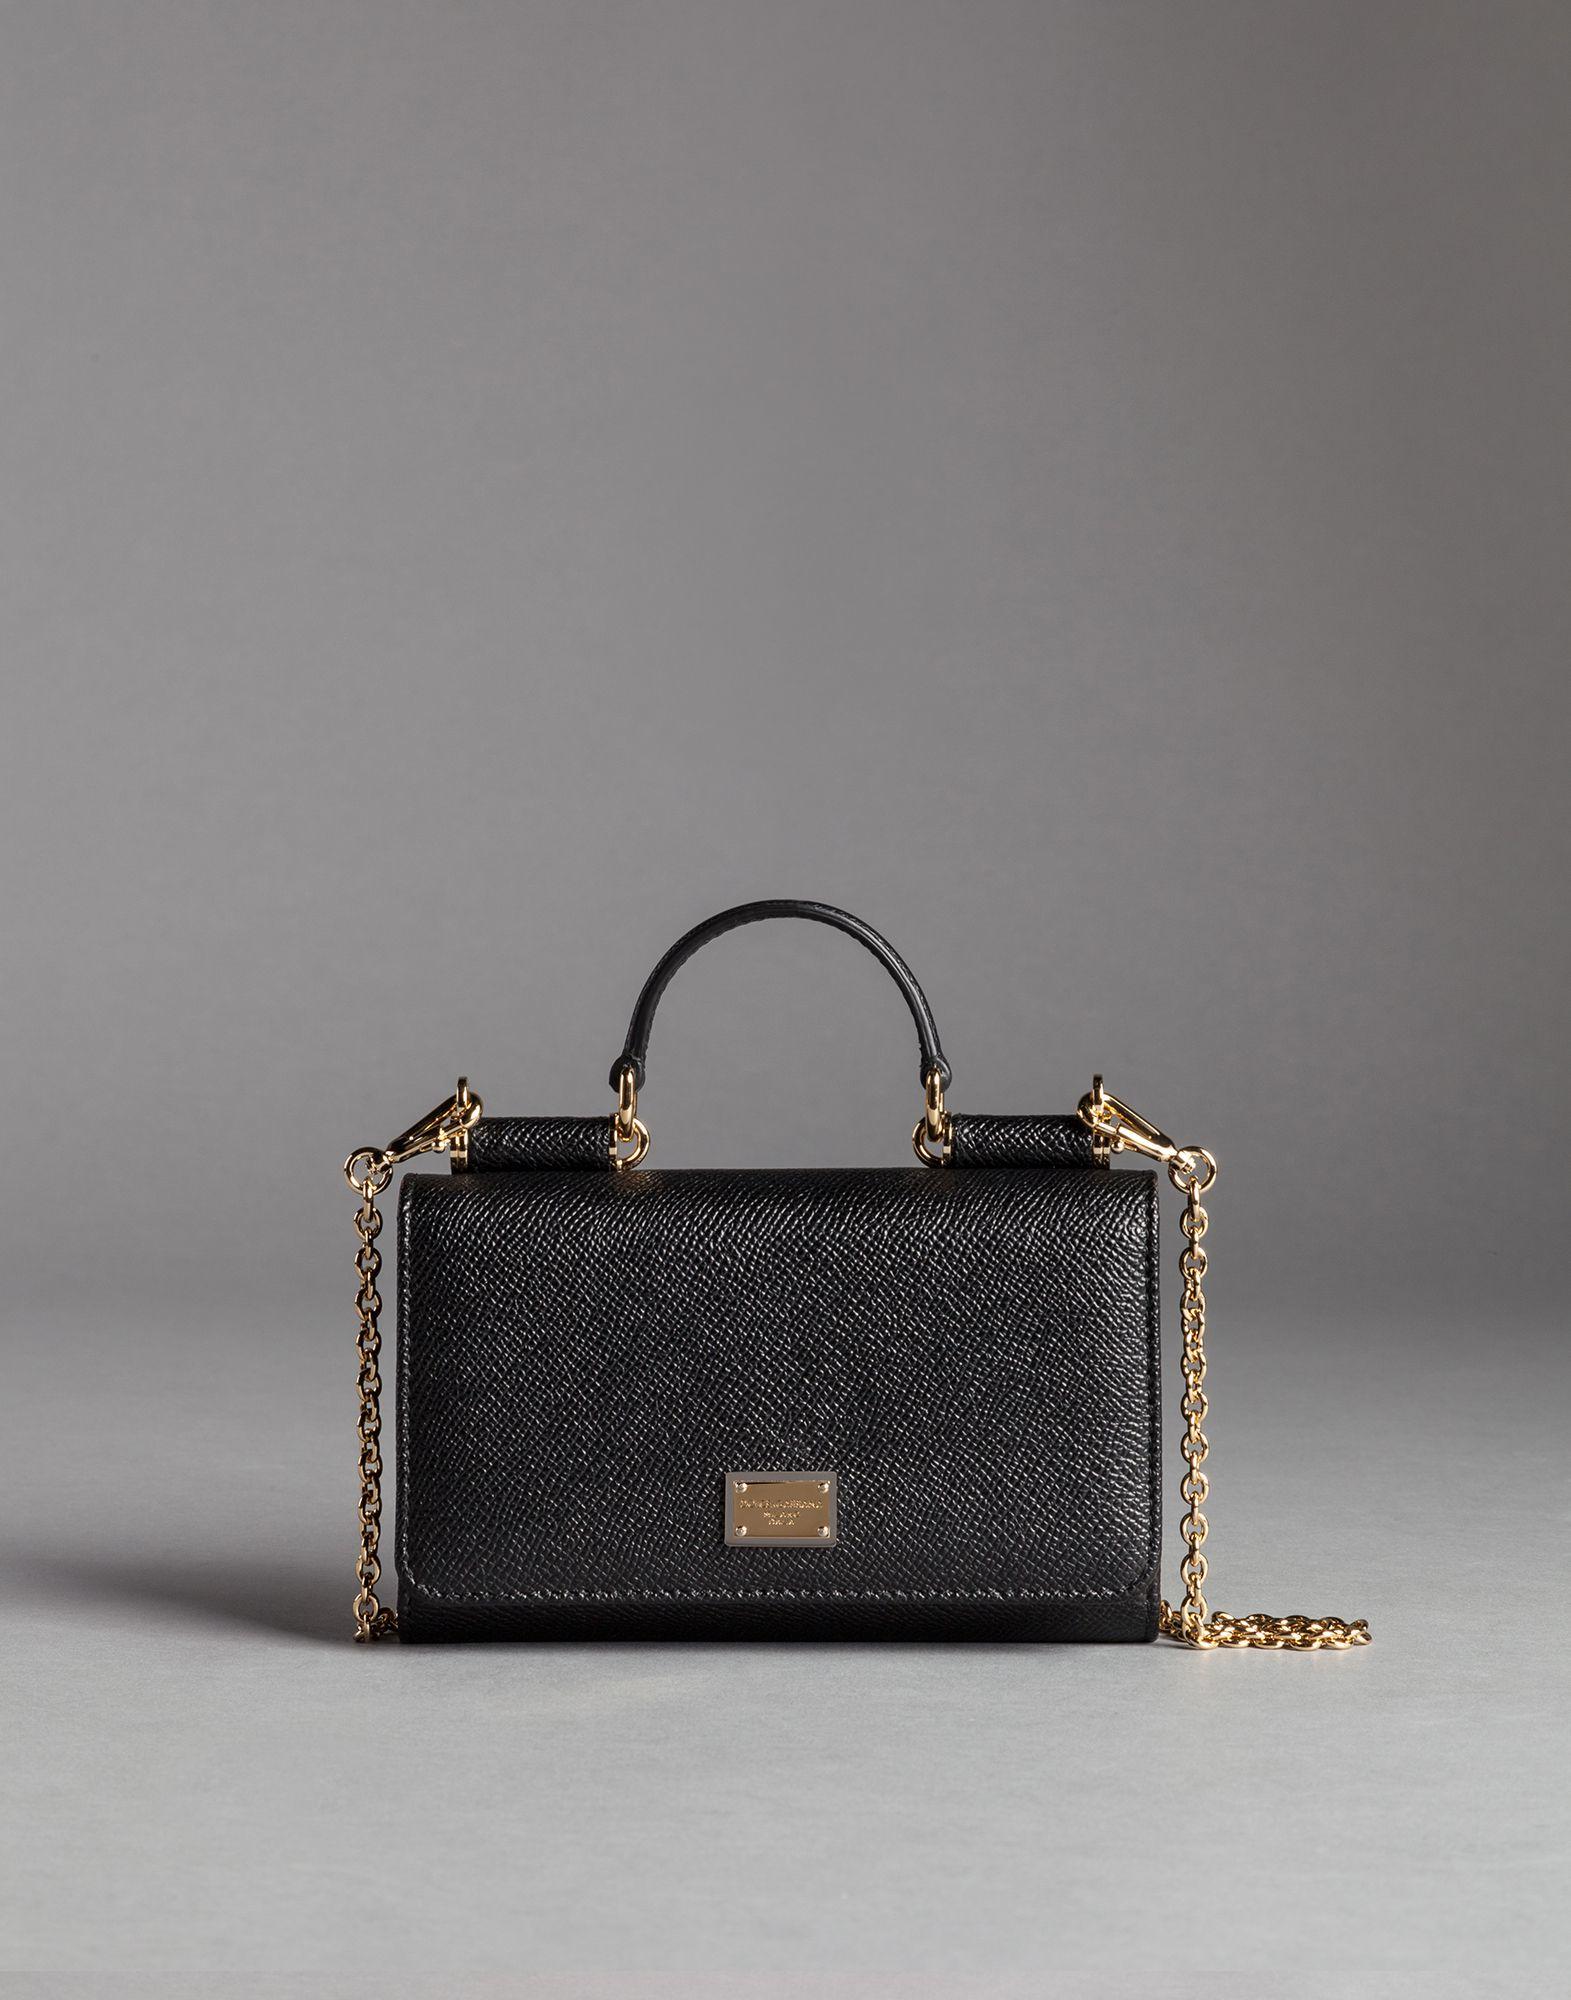 81584bcbf904 Lyst - Dolce   Gabbana Mini Von Bag In Dauphine Print Leather in Black